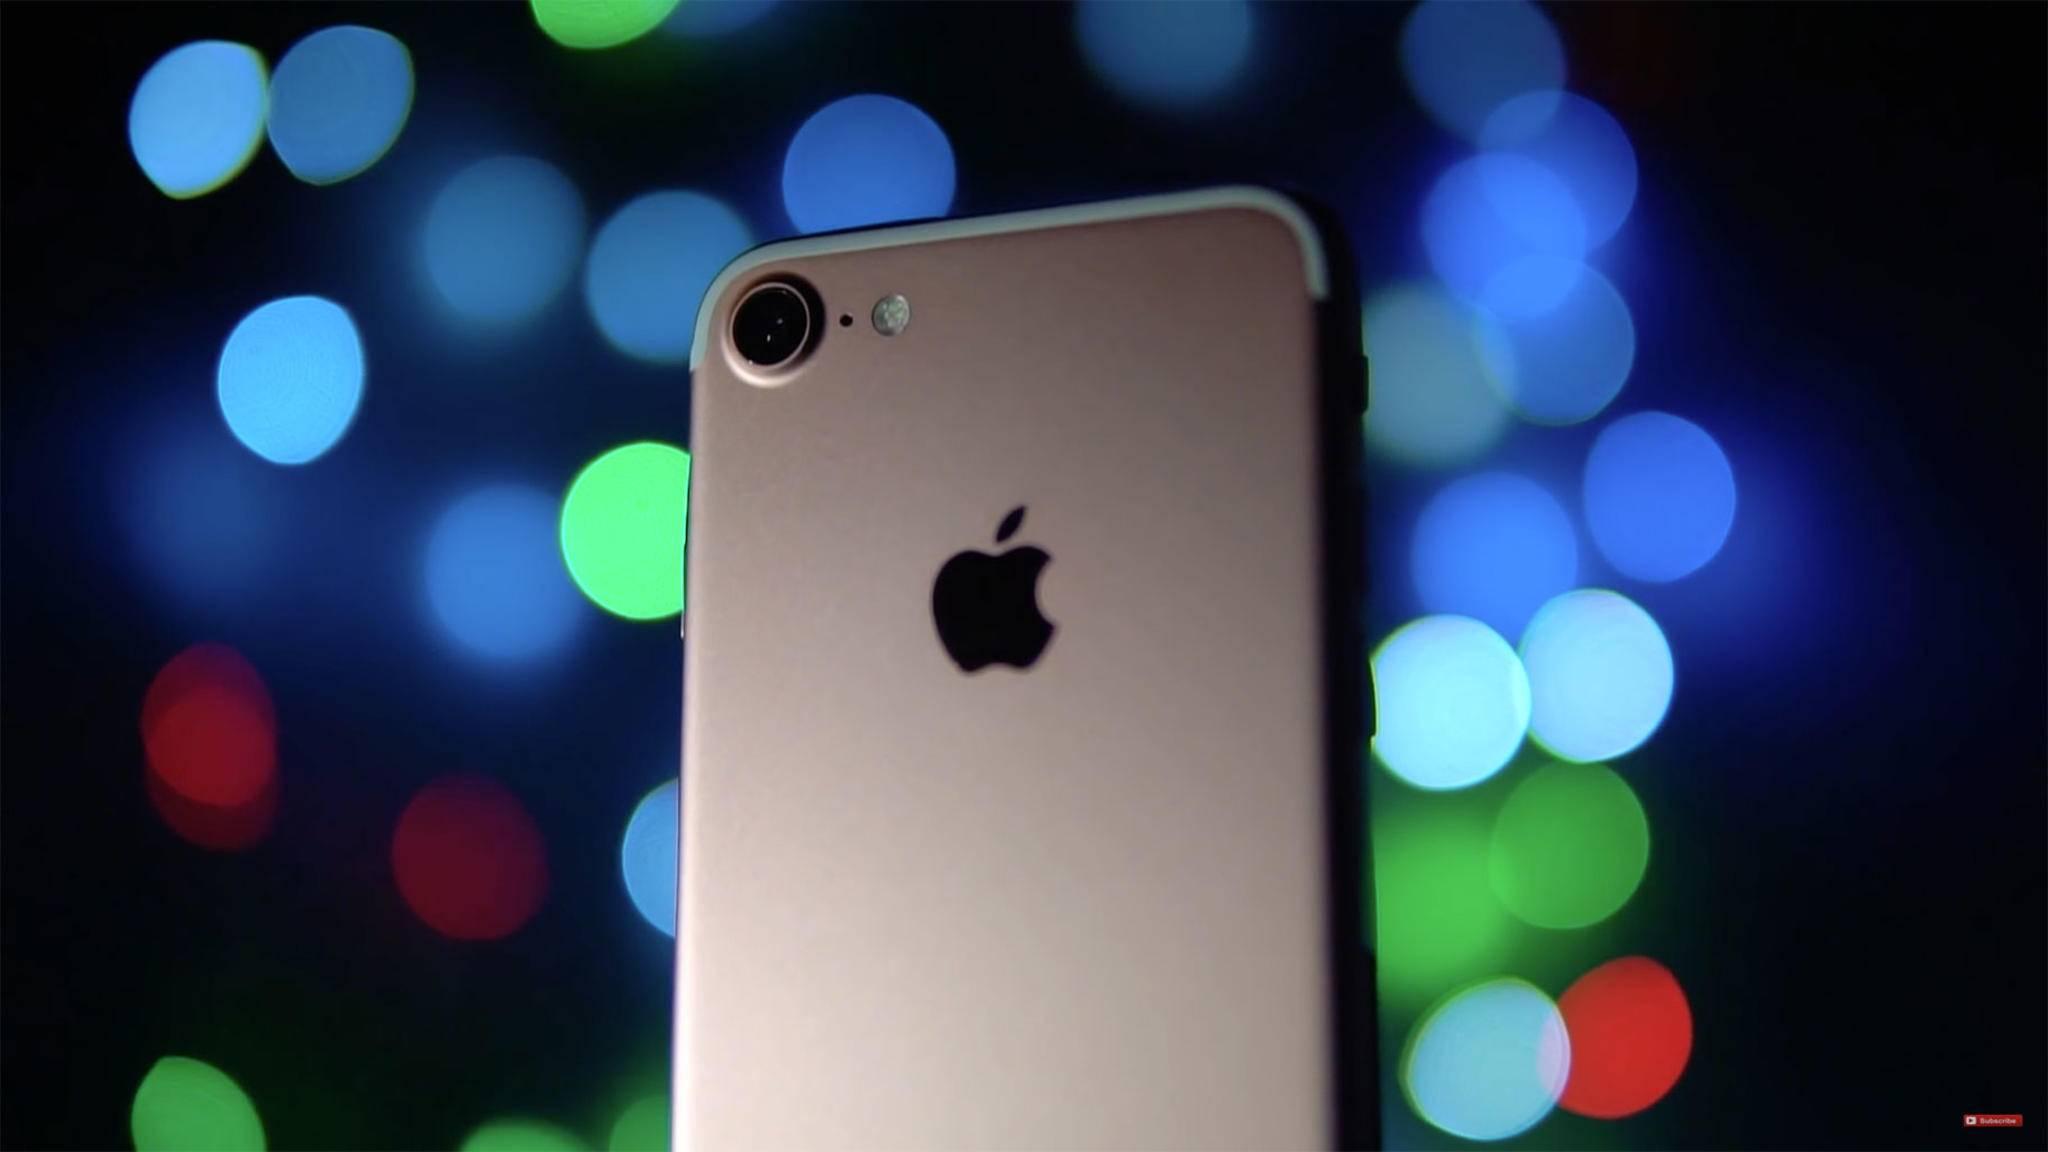 Iphone X Lässt Sich Nicht Ausschalten